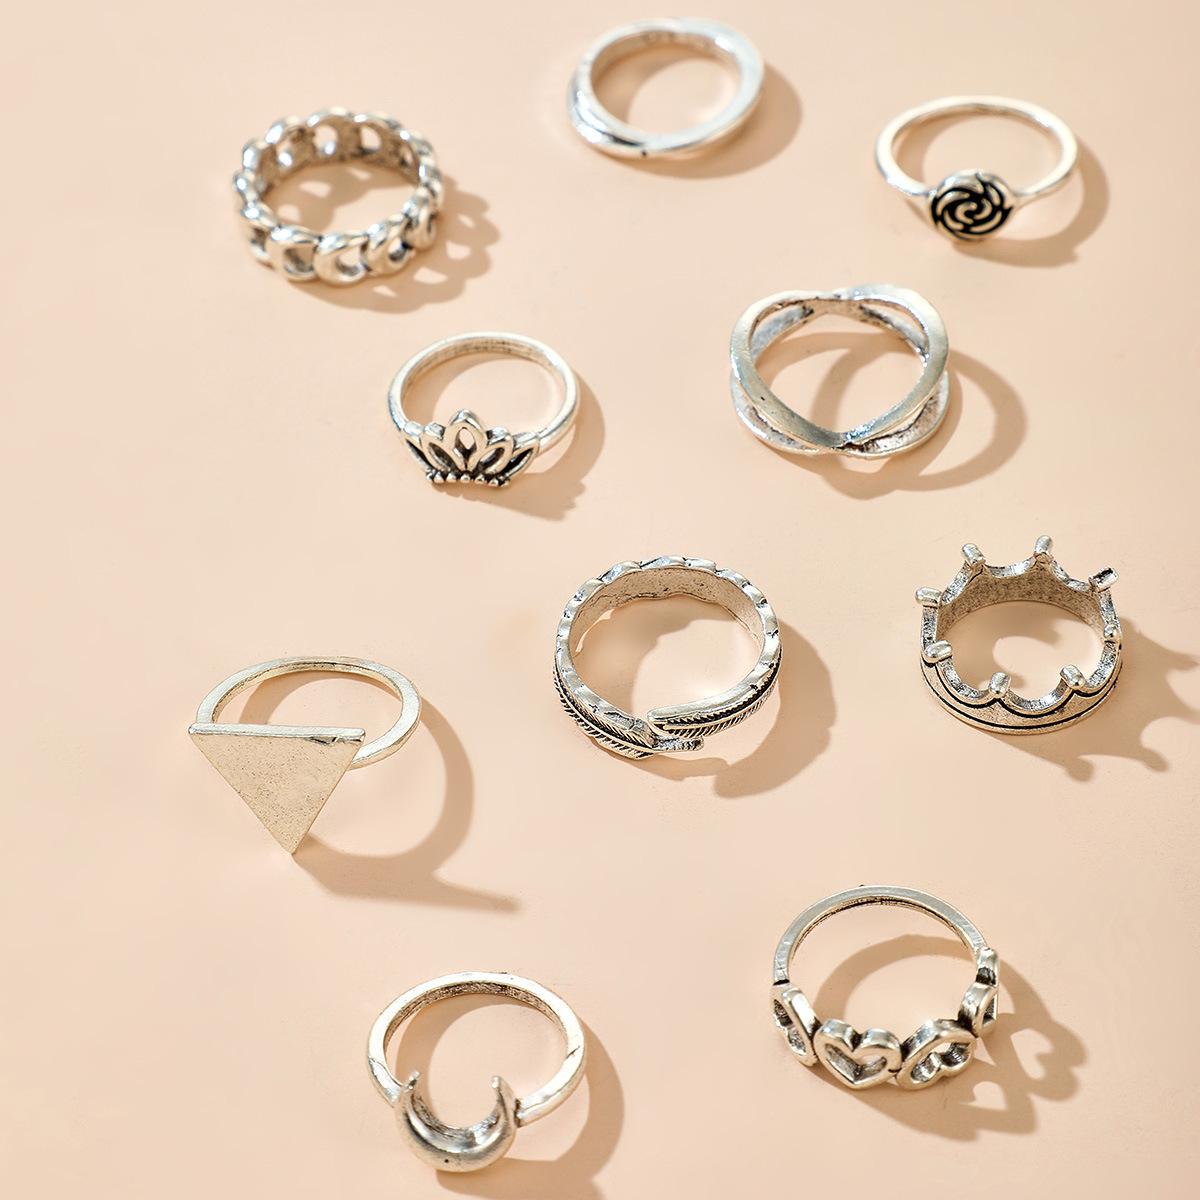 Geometric alloy ring ring set popular flower crown leaf cross triangle love ring set NHGY213889